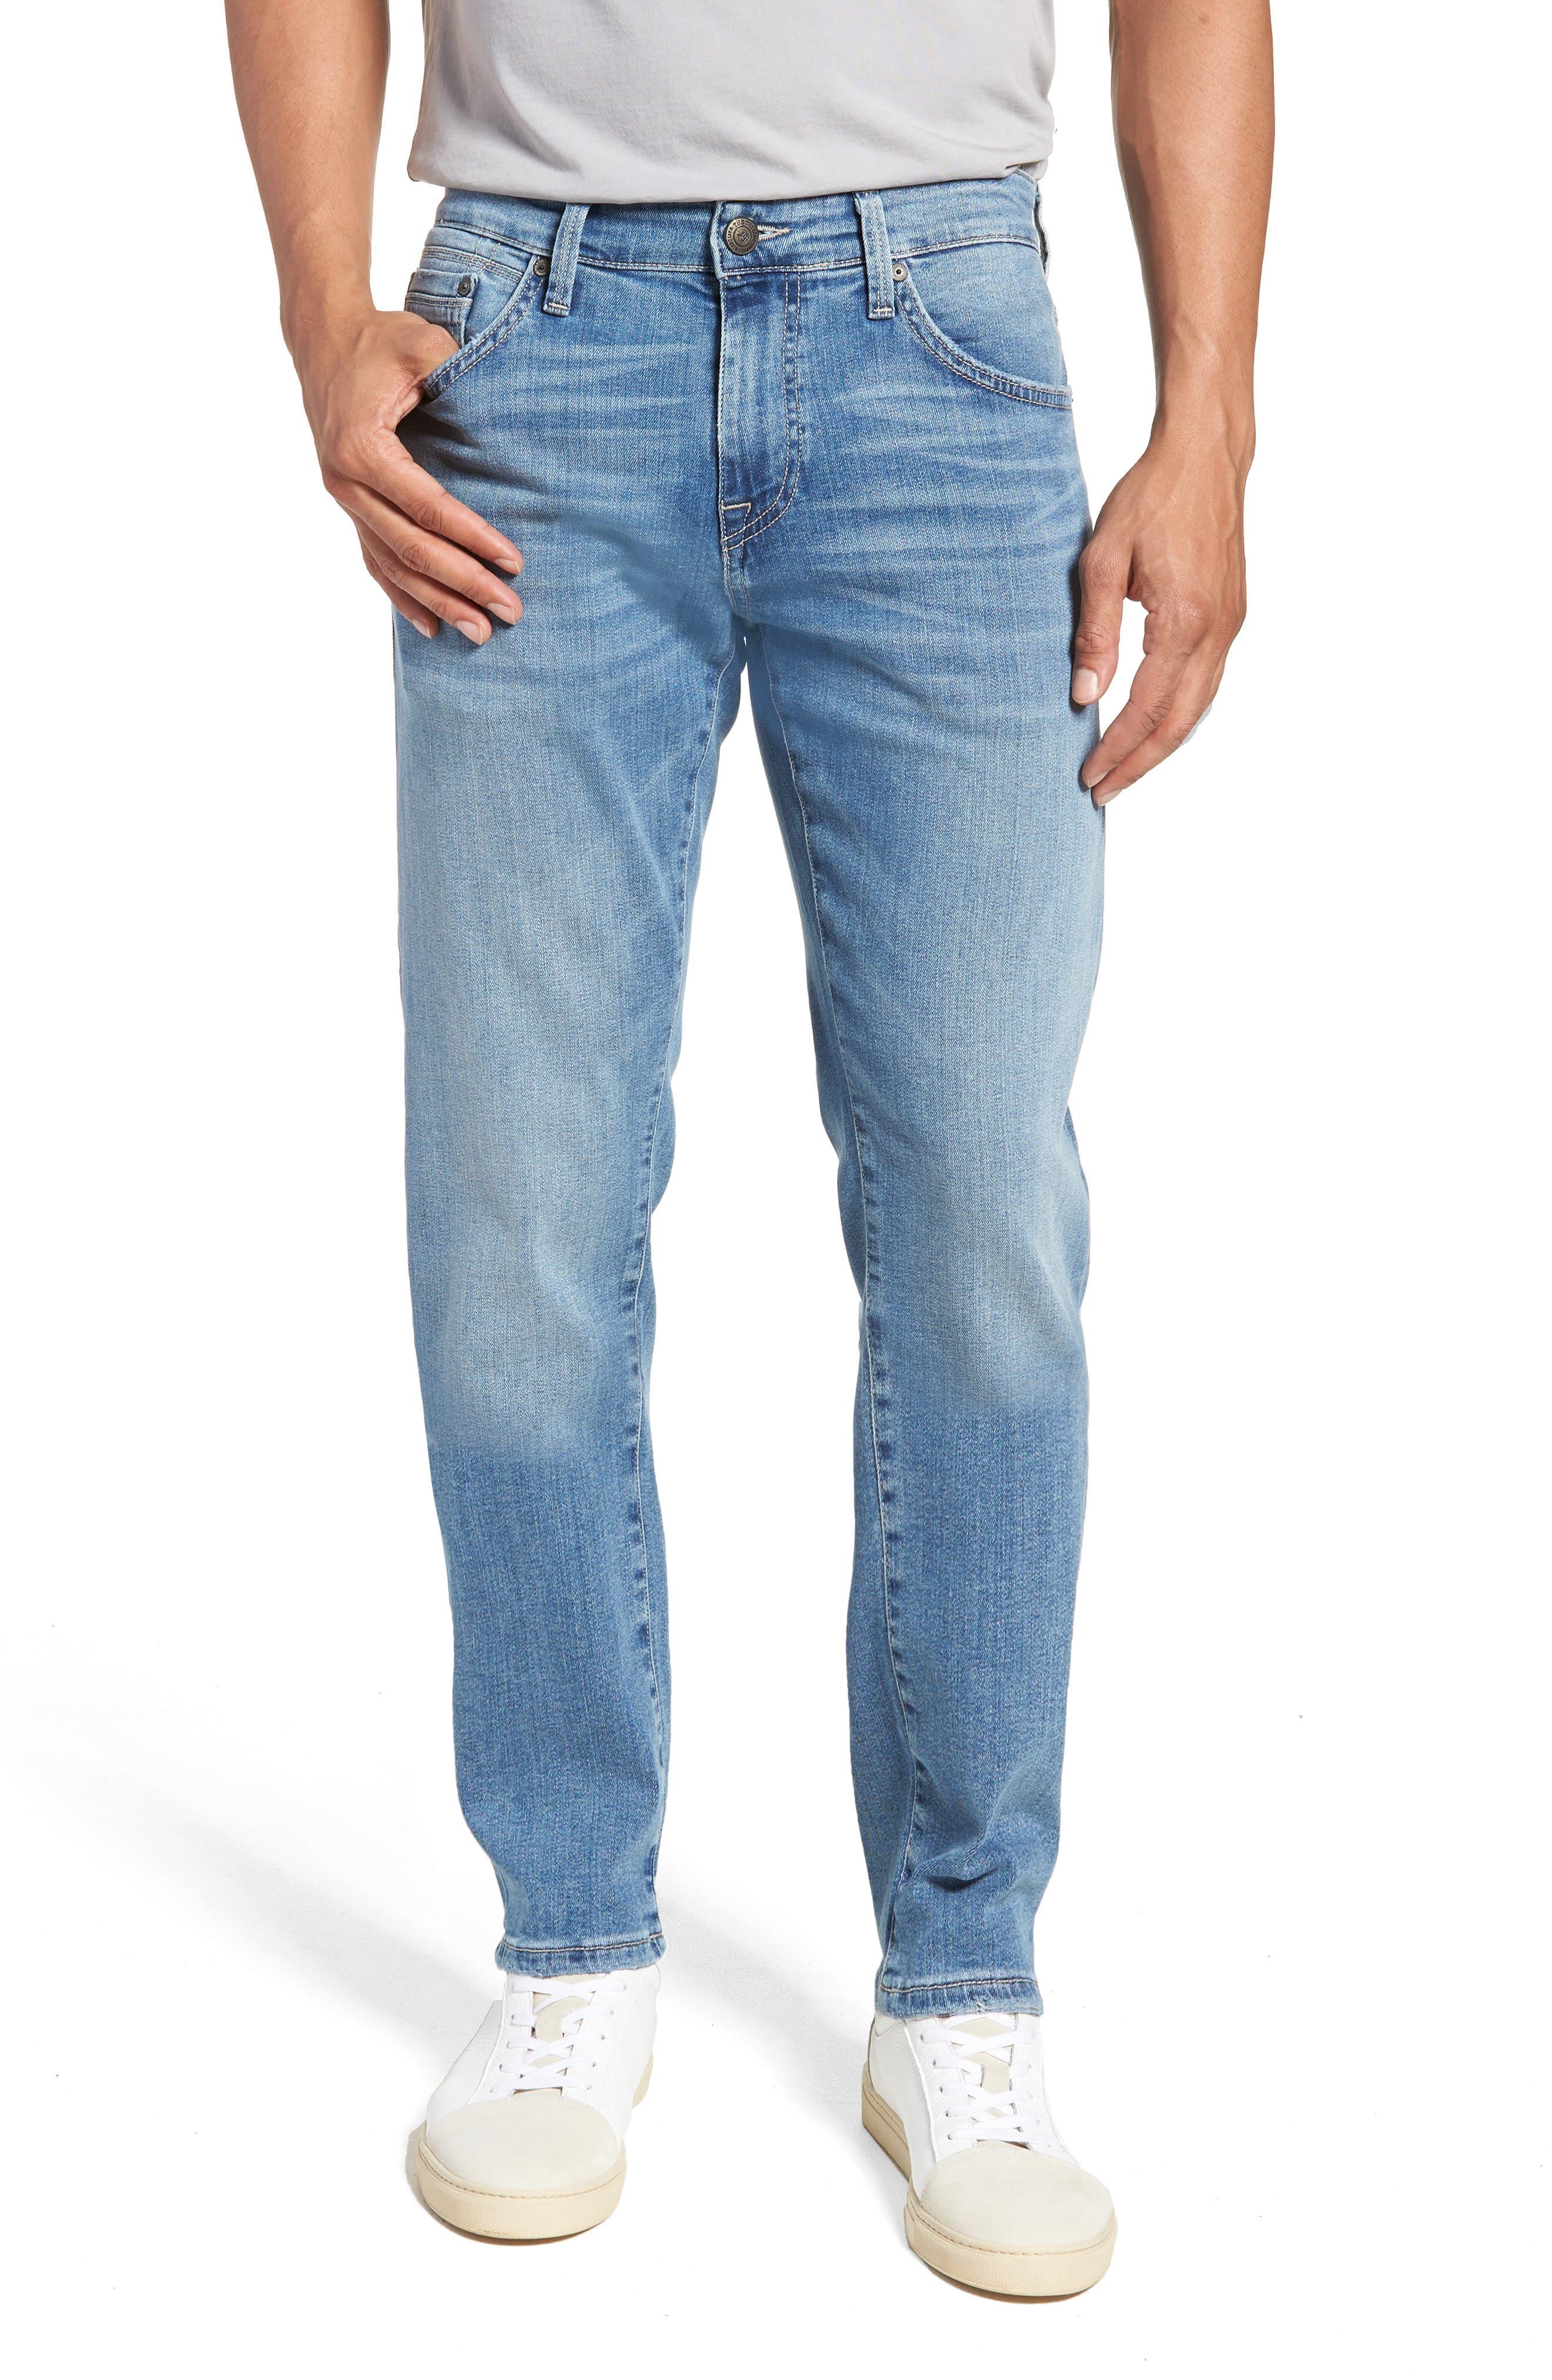 Jake Slim Fit Jeans,                             Main thumbnail 1, color,                             Light Blue Willamsburg